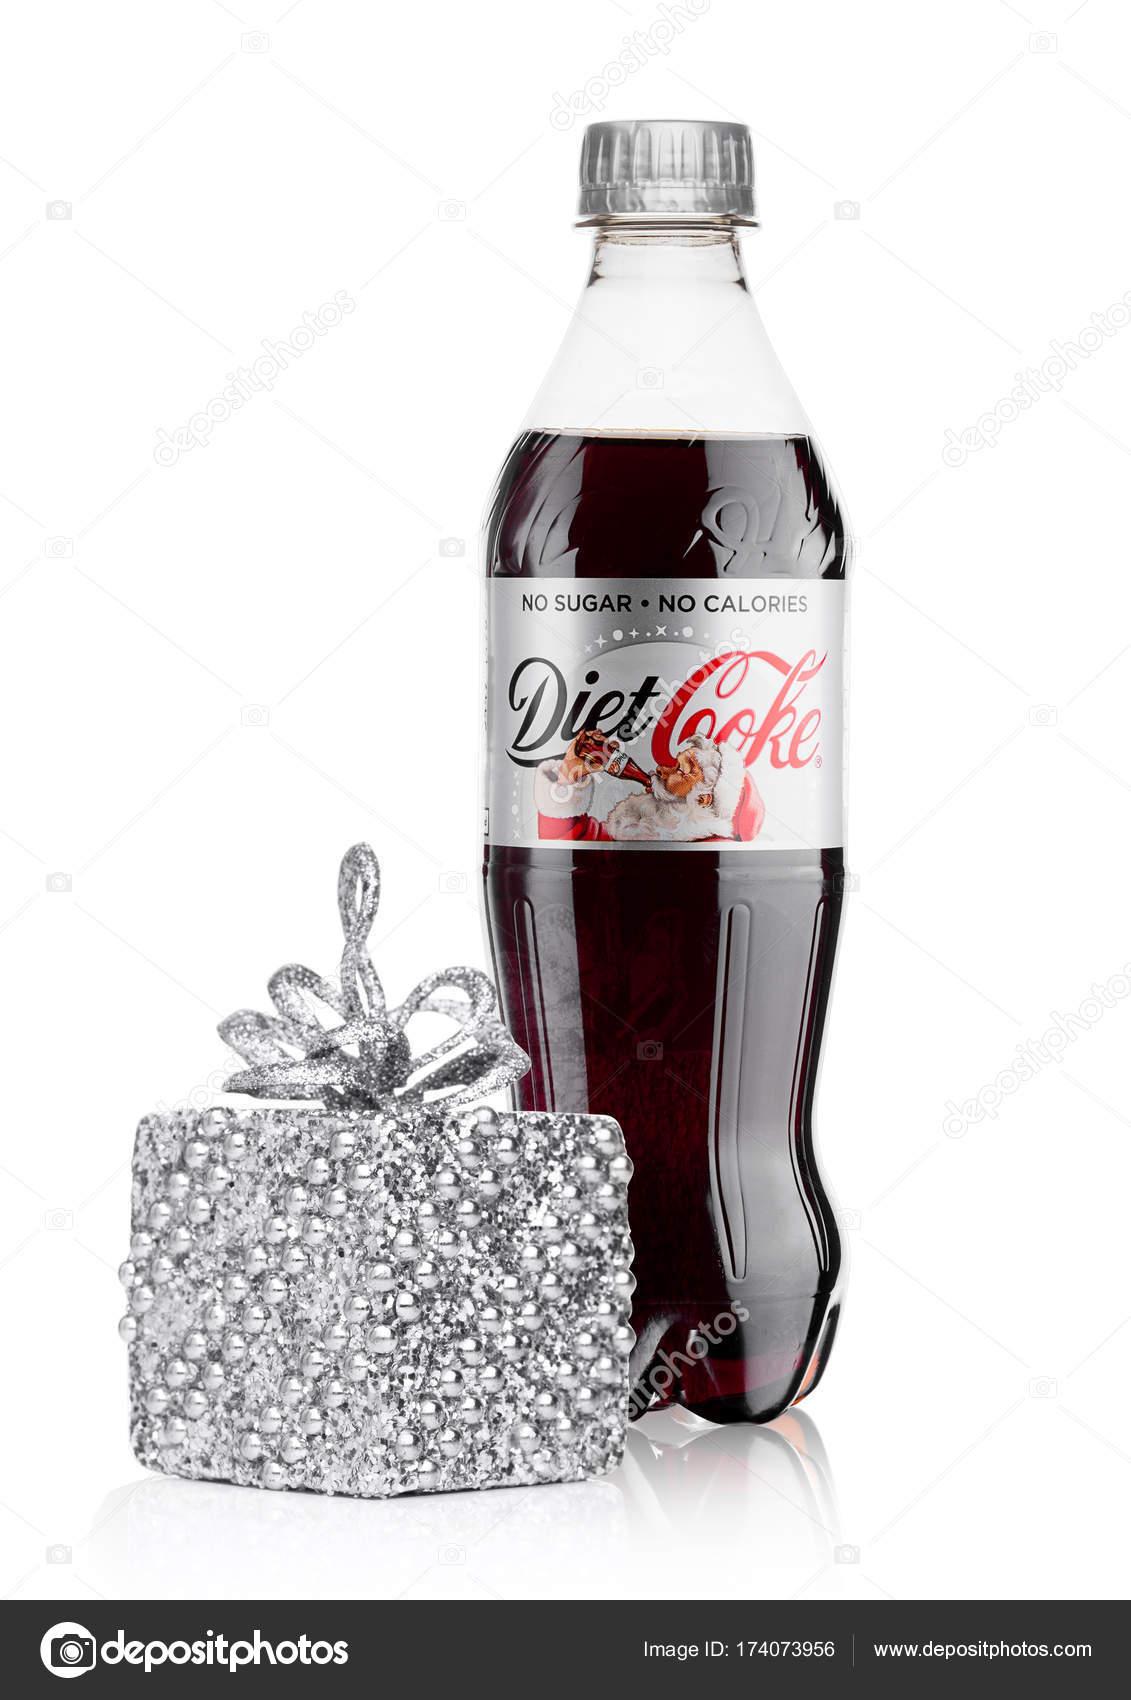 London Uk 17 November 2017 Flasche Diat Coca Cola Auf Weiss